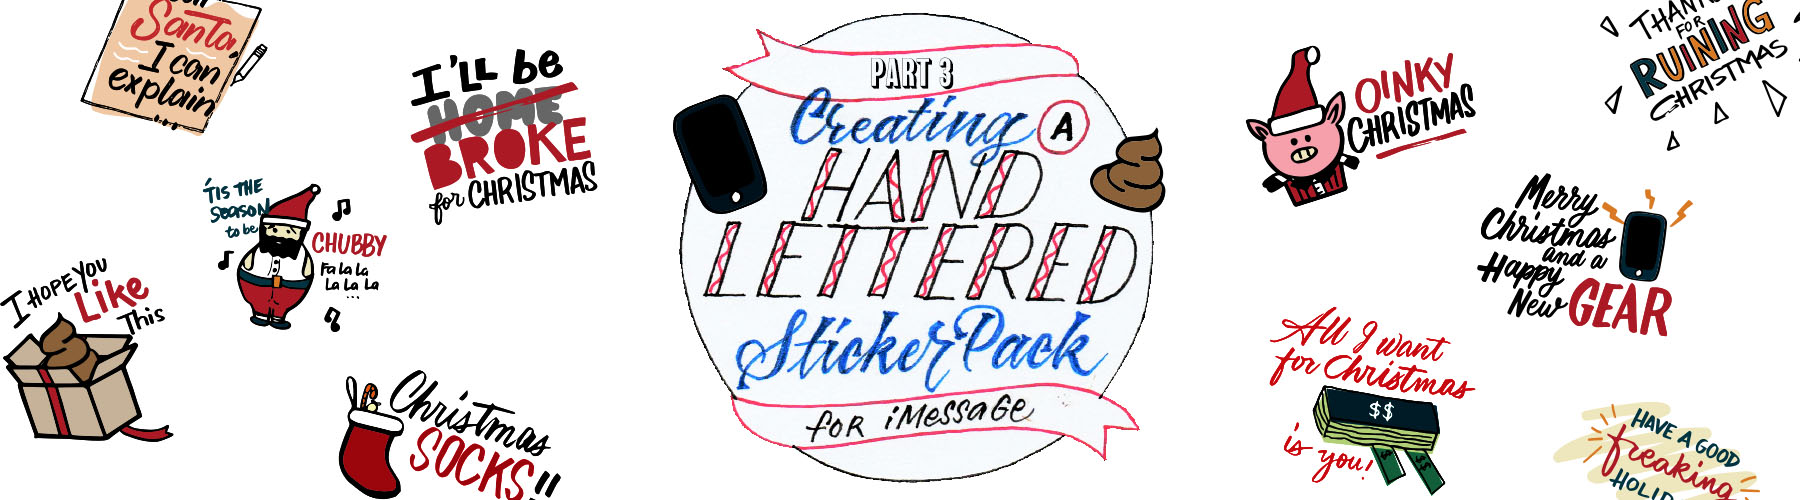 Creating-a-HandLettered-Sticker-Pack-for-iMessageArtboard-1.jpg